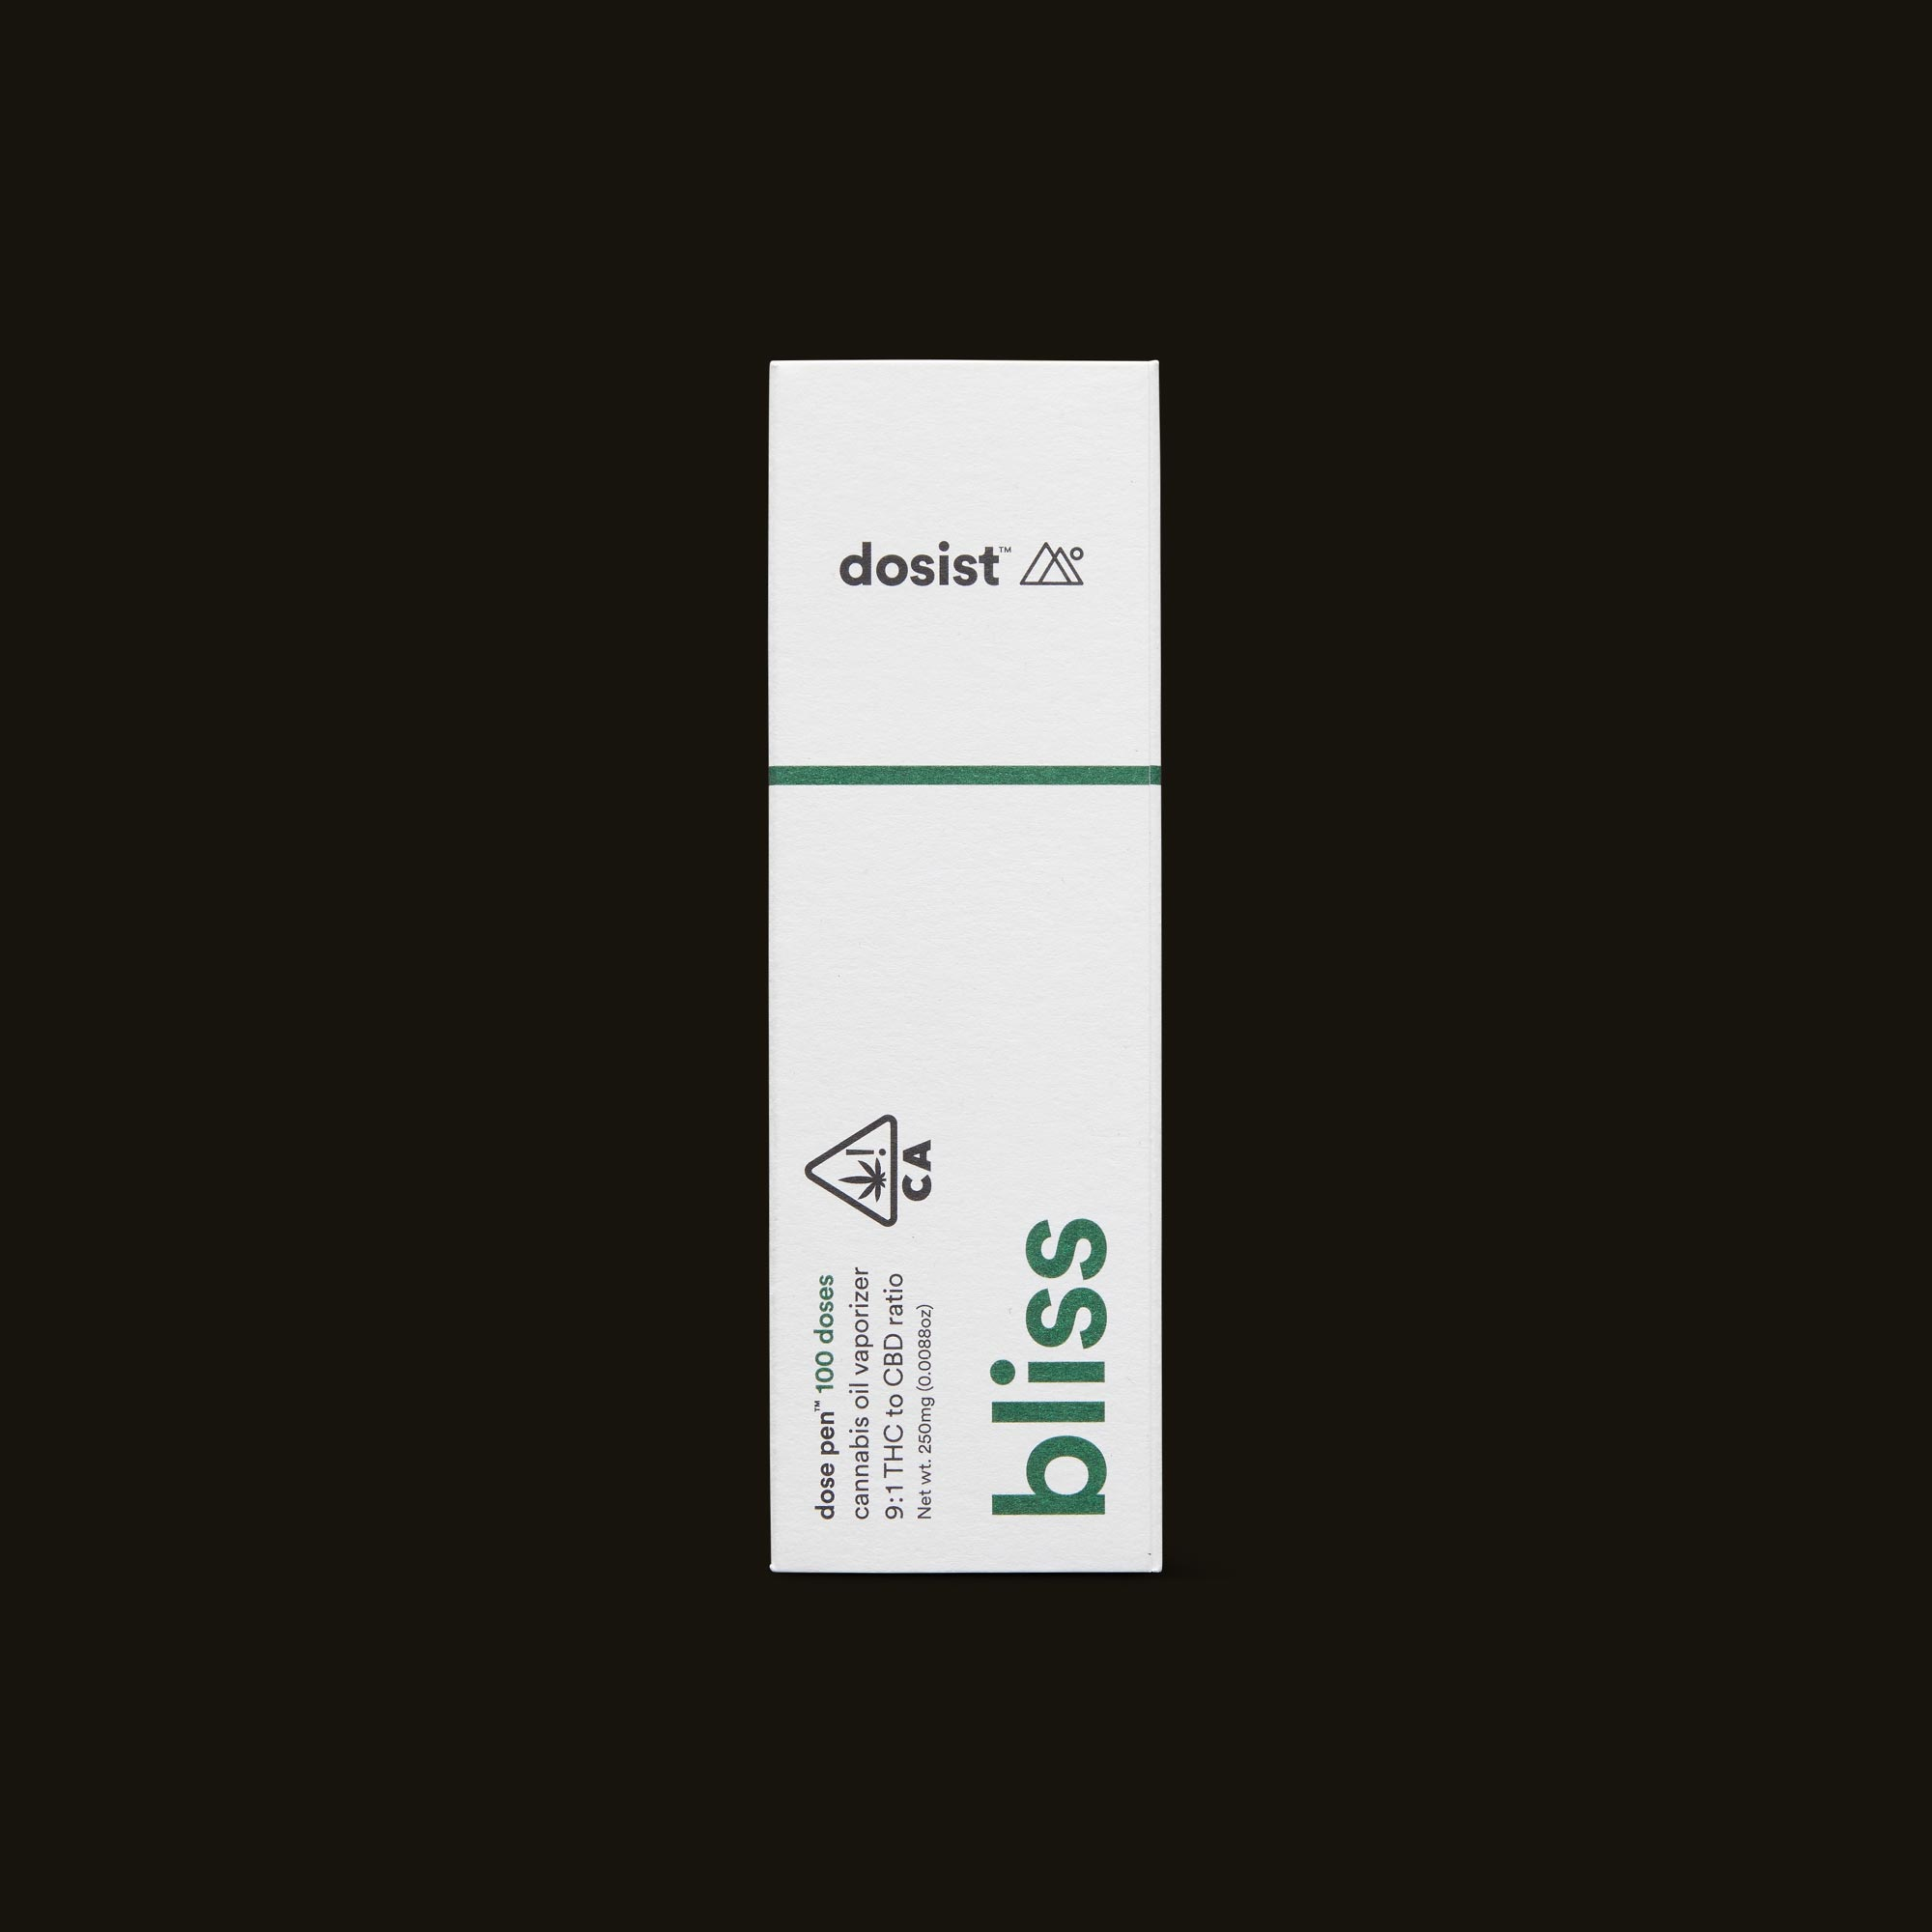 dosist bliss dose pen front box